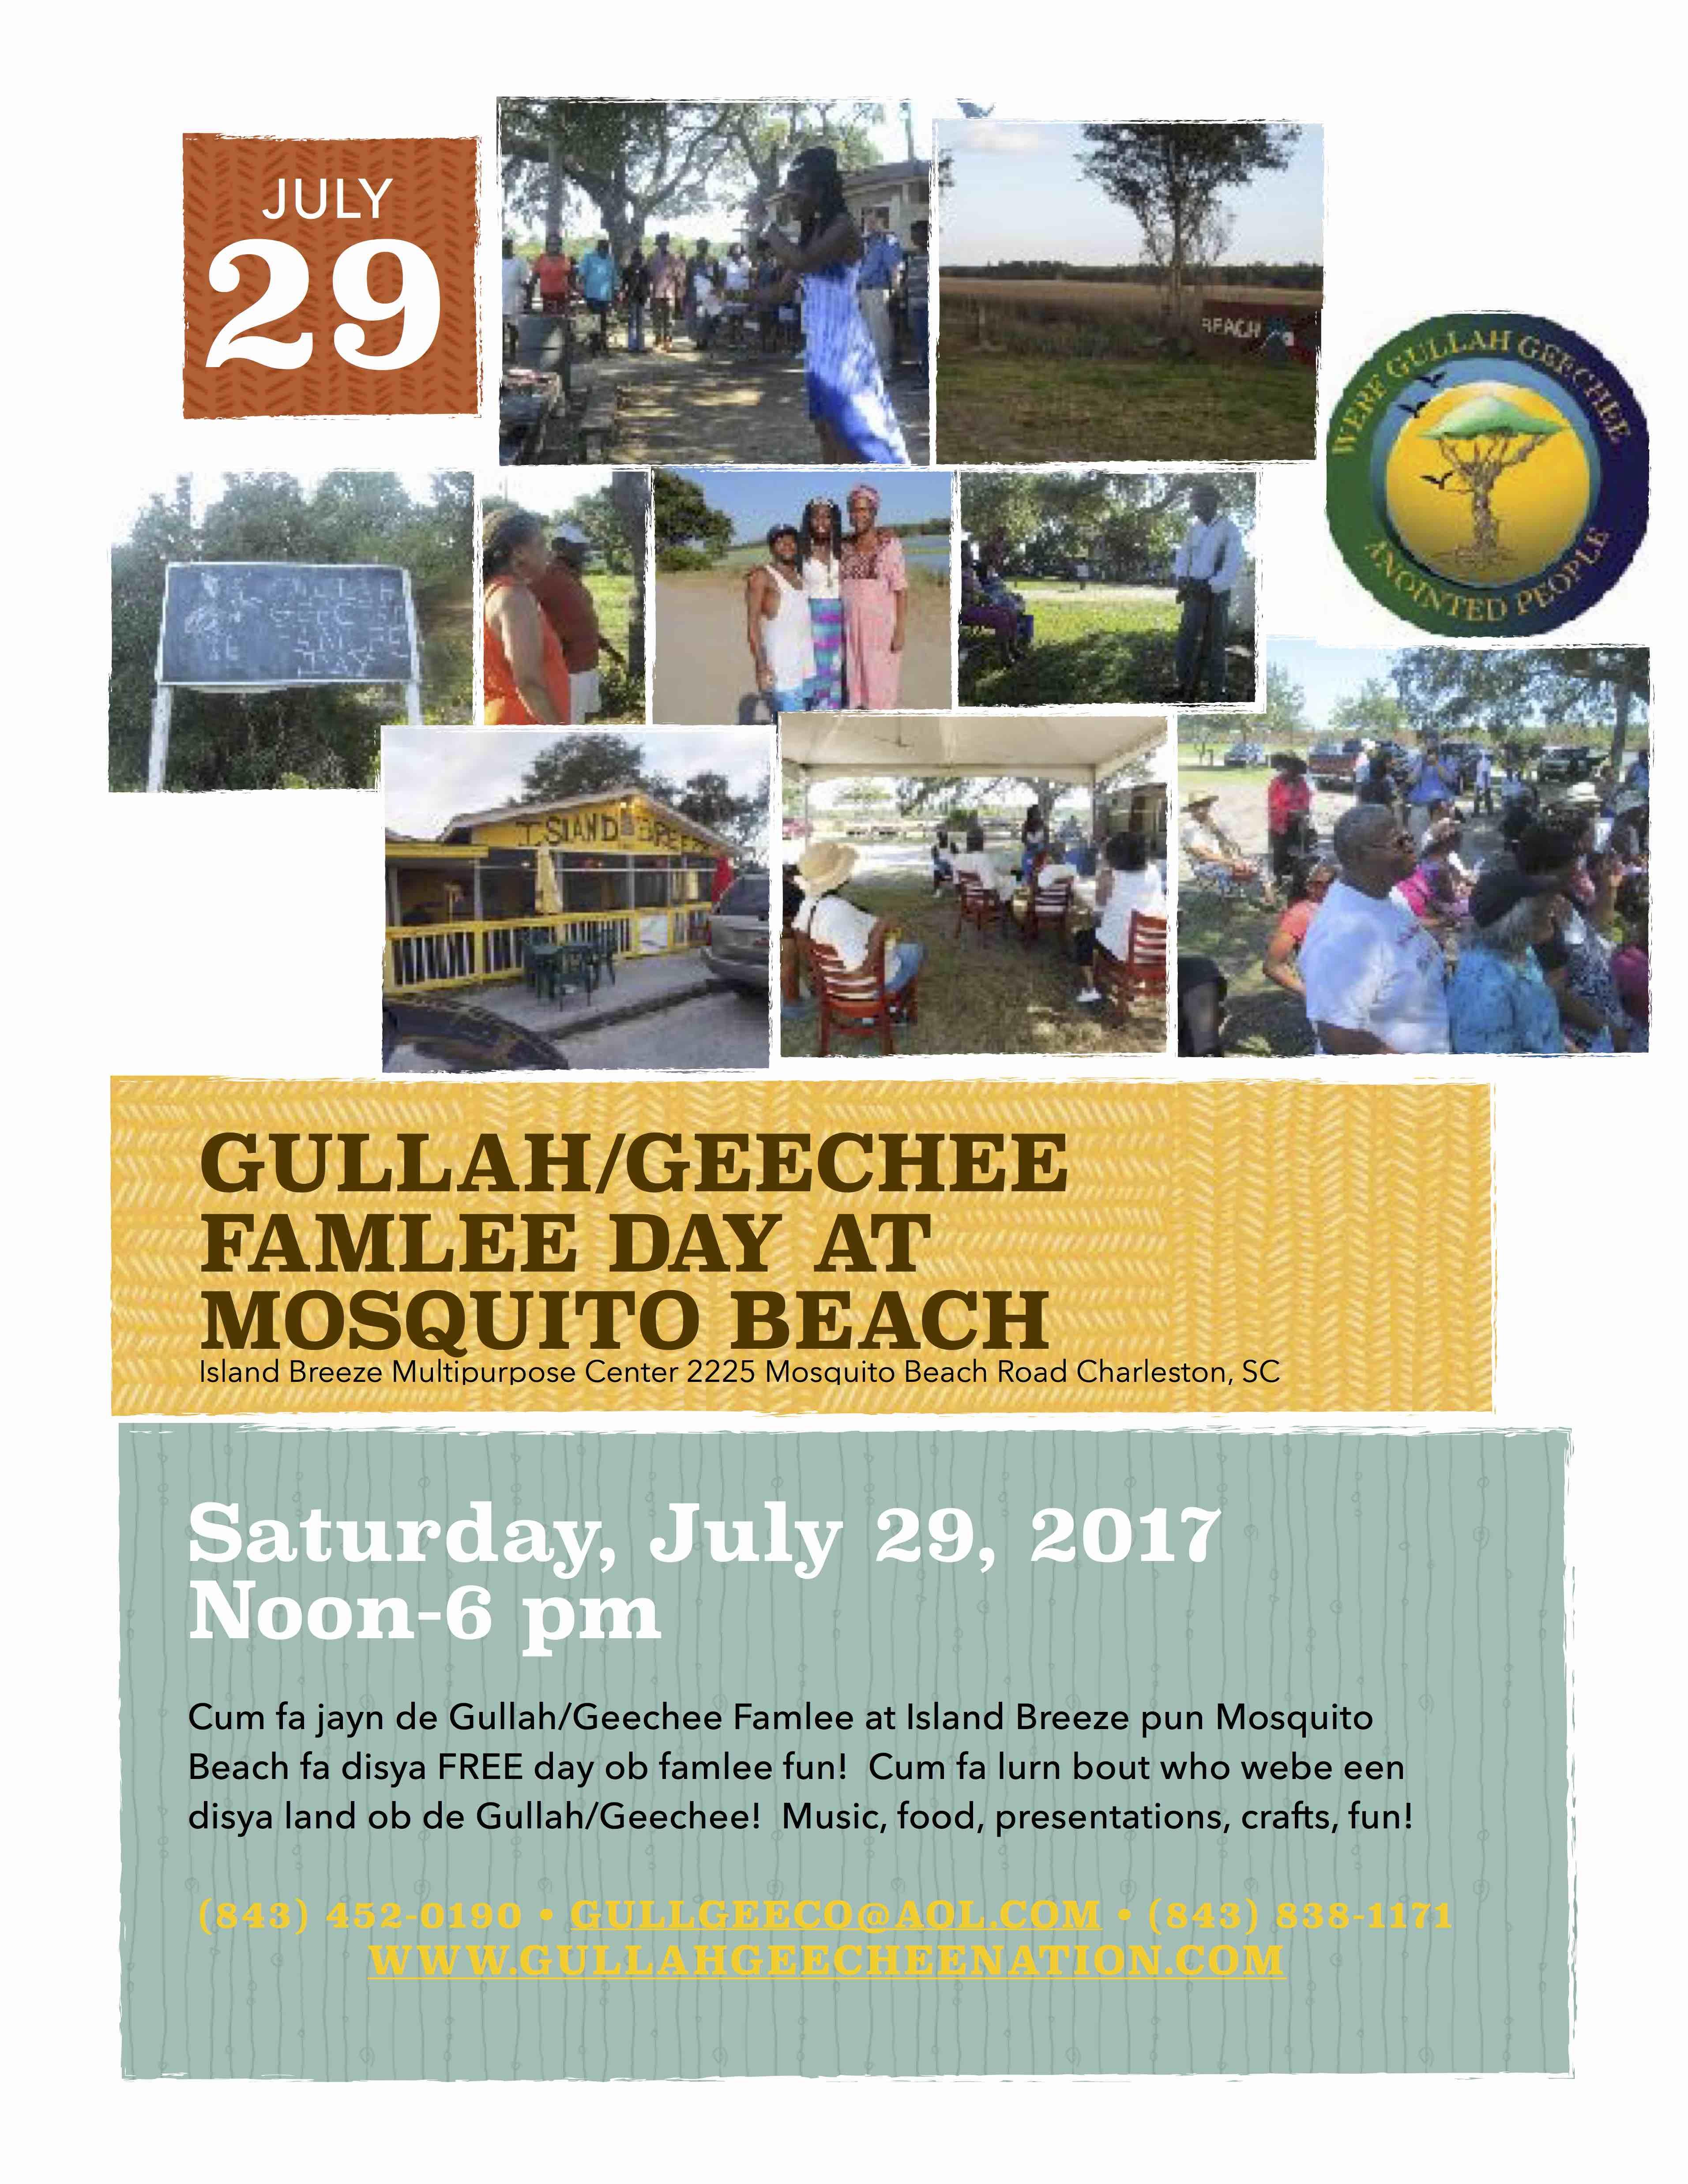 Gullah/Geechee Famlee Day at Mosquito Beach 2017